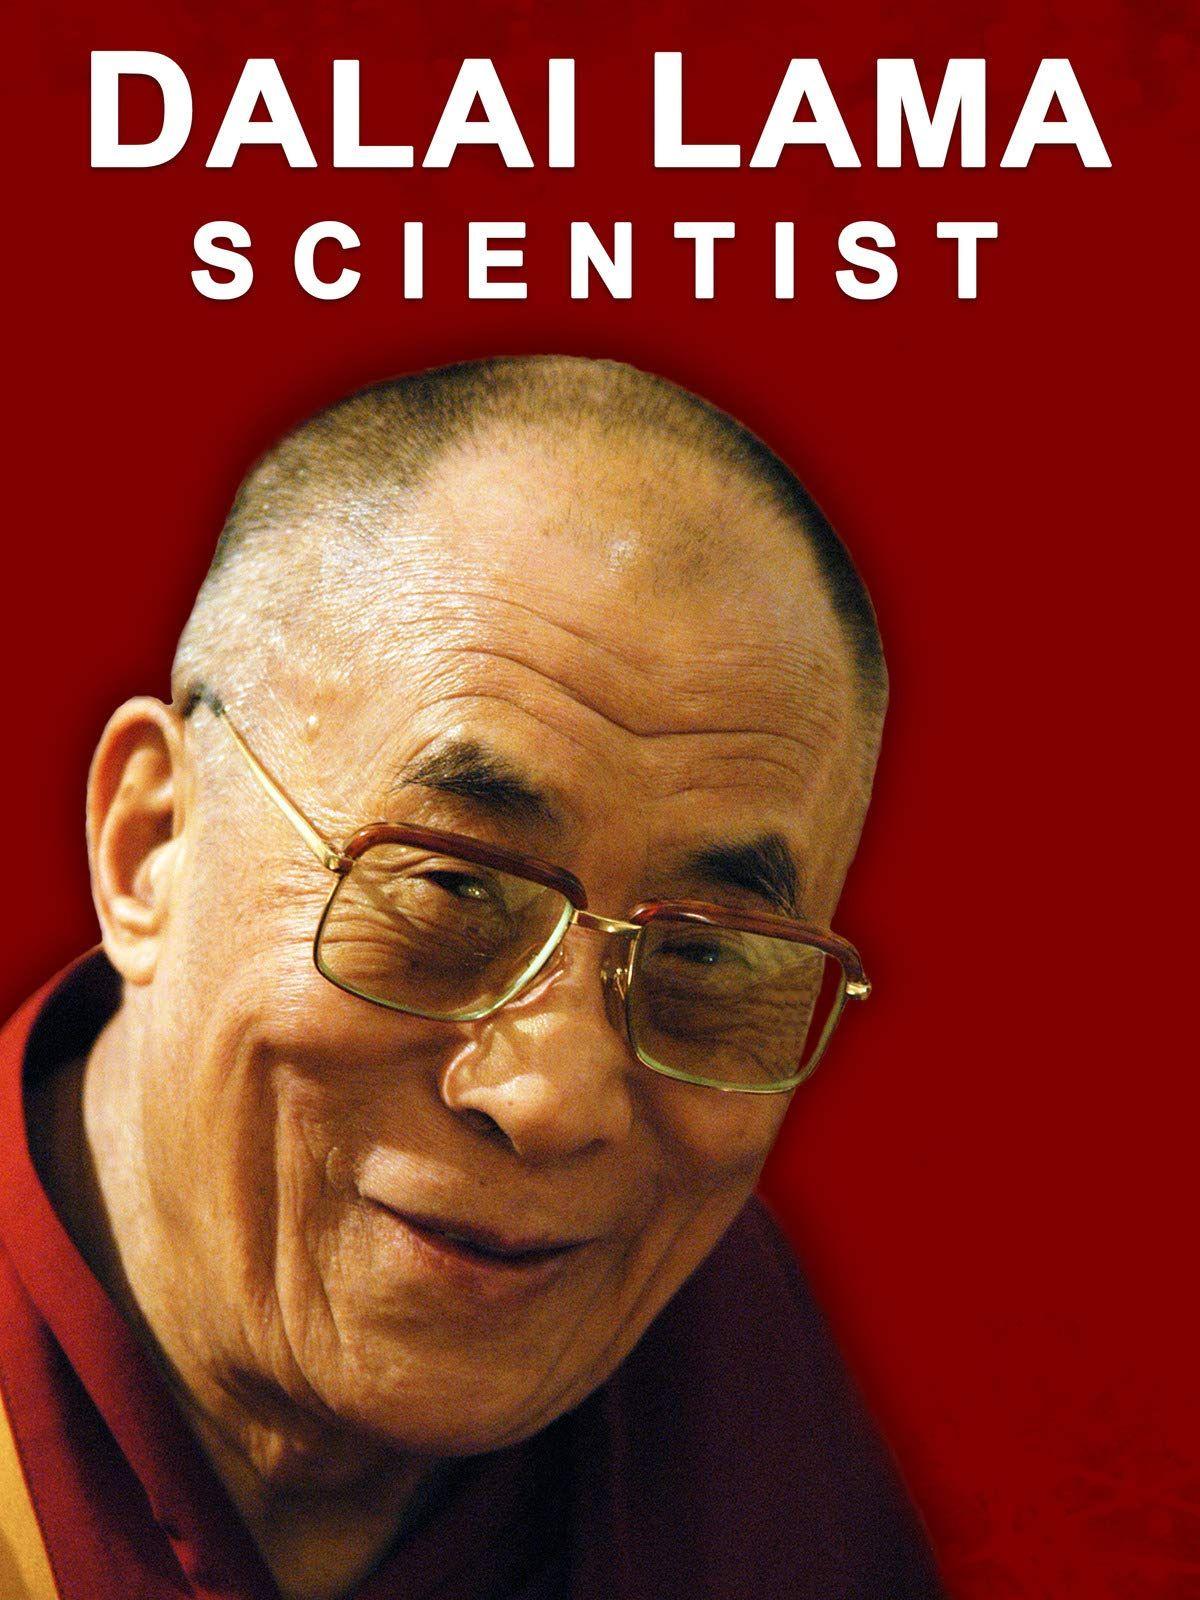 Dalai Lama Science And Philosophy